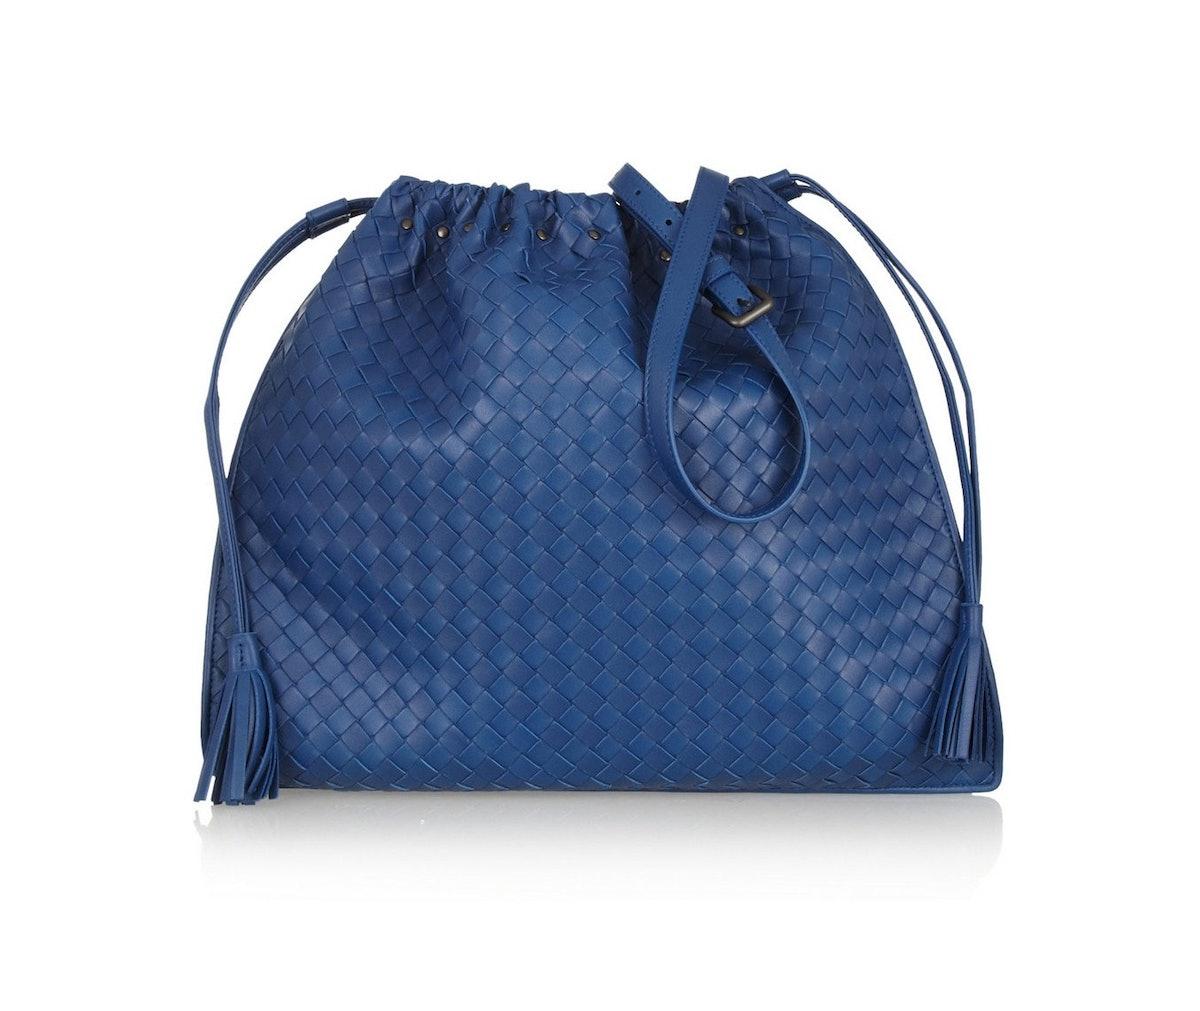 Bottega Veneta Bucket Bag